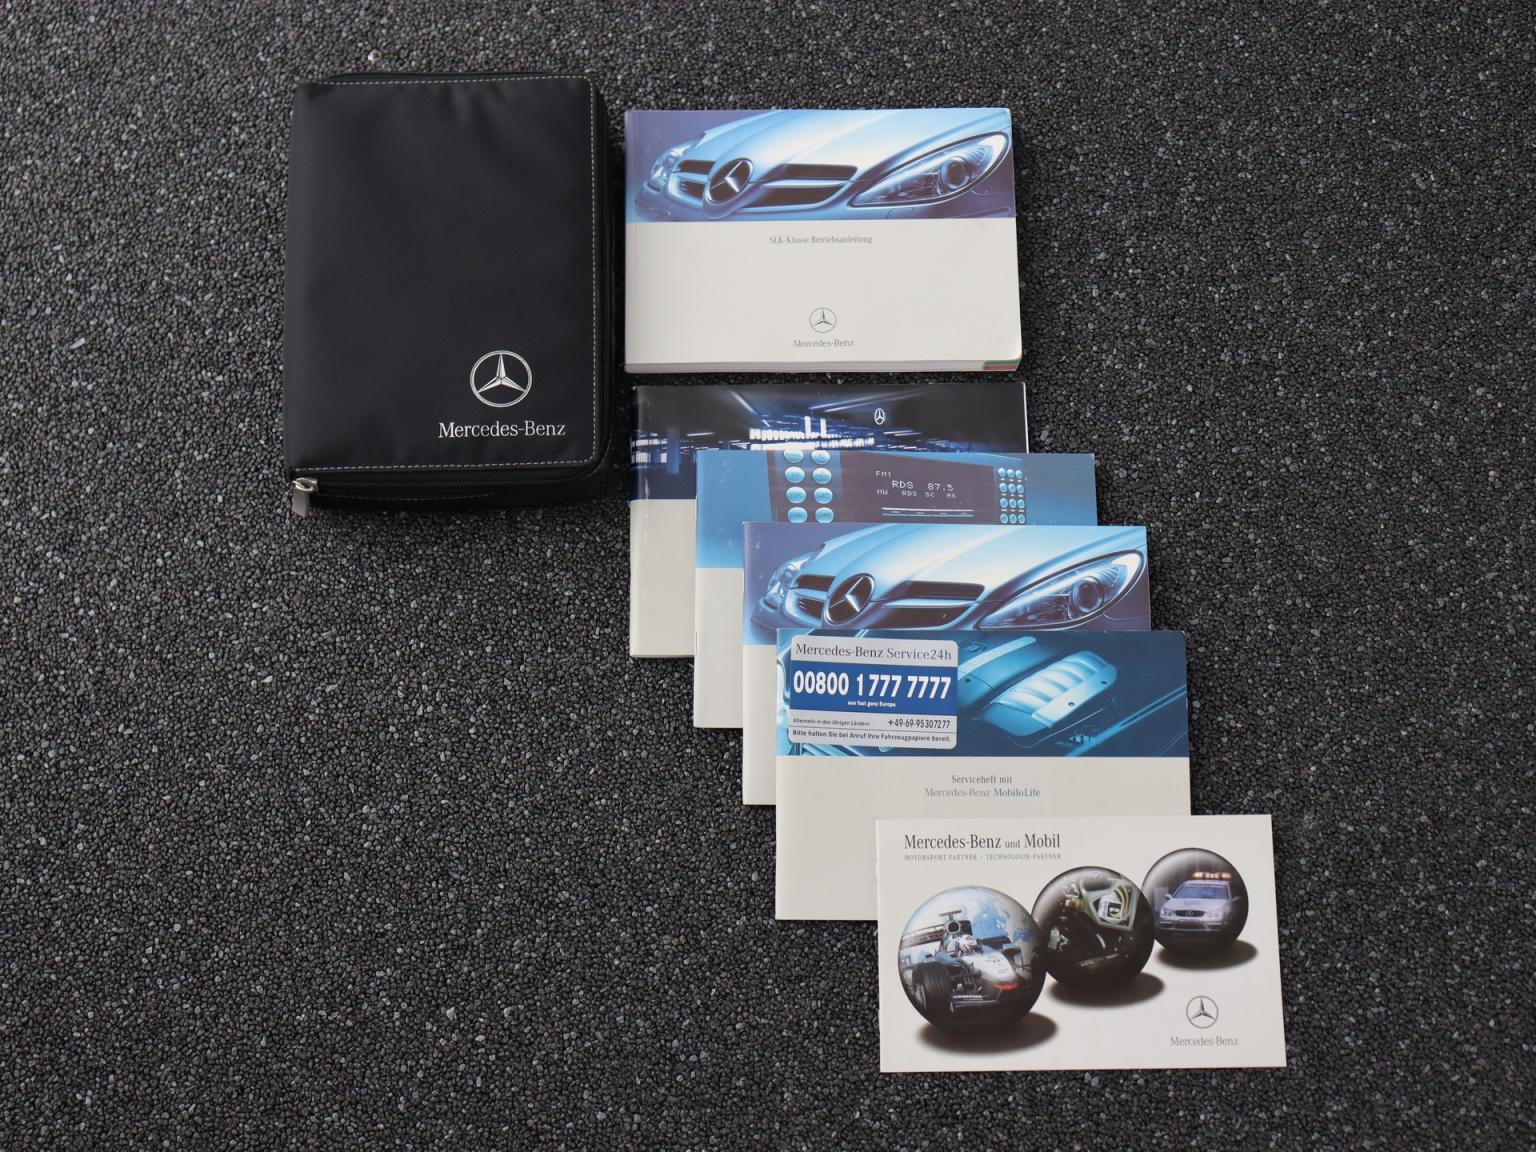 Mercedes-Benz-SLK-39